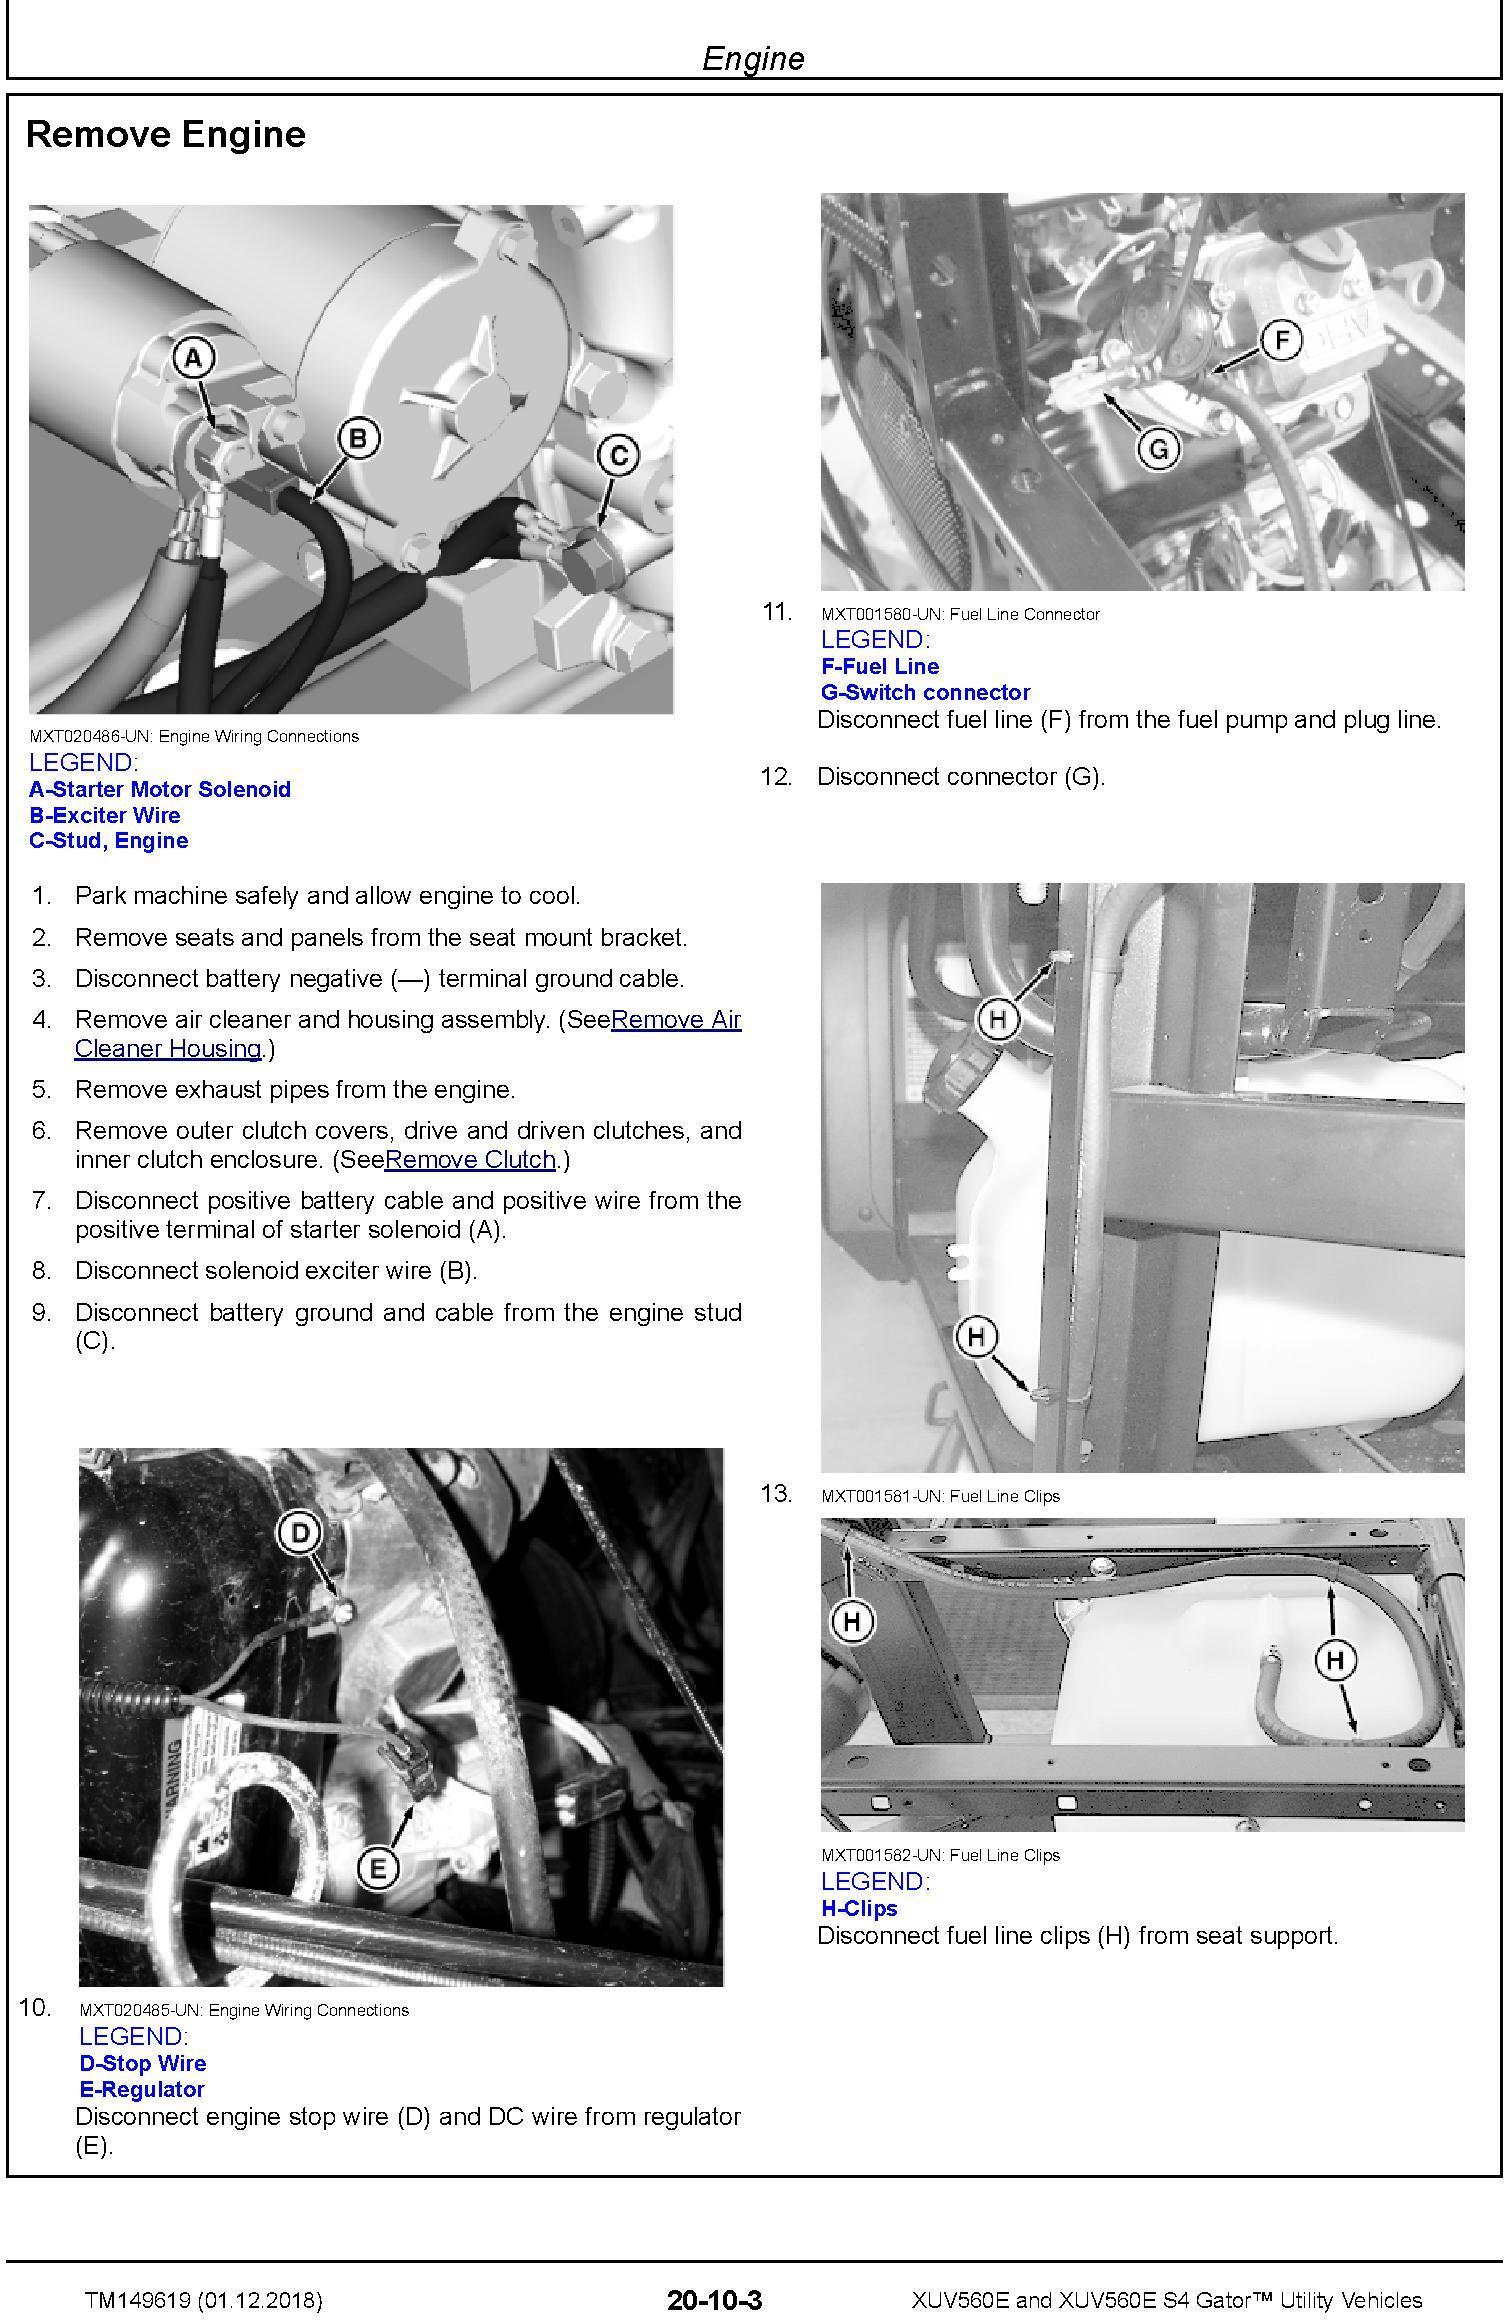 John Deere XUV560E and XUV560E S4 Gator Utility Vehicles (SN. 010001-) Technical Manual (TM149619) - 1